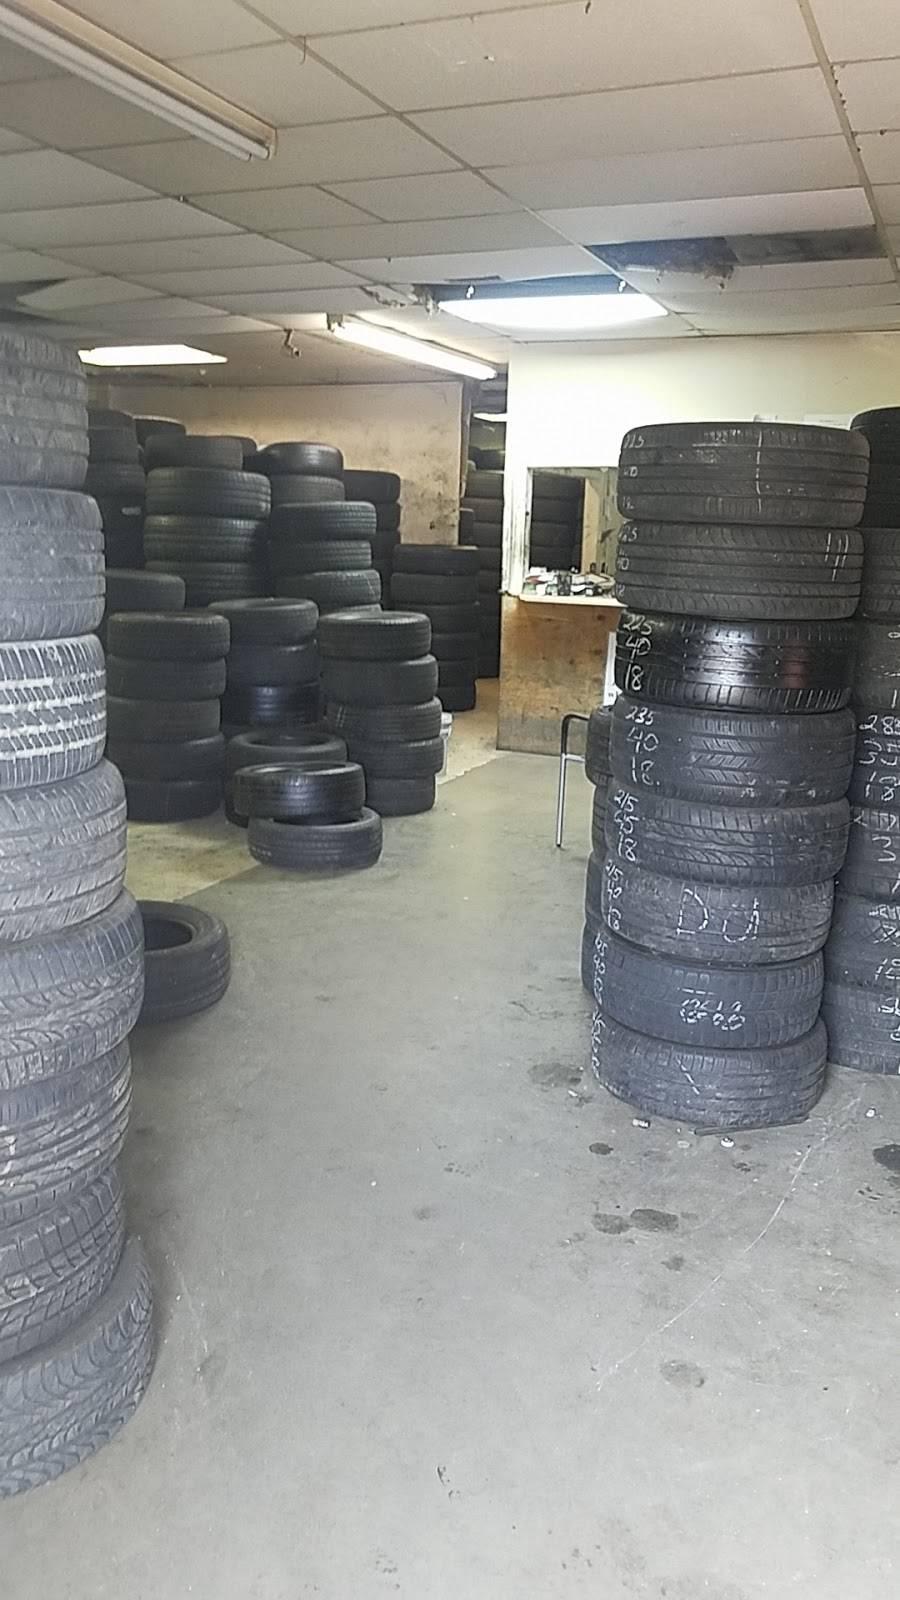 Dales Discount Tires - car repair  | Photo 6 of 10 | Address: 820 Finley Ave W, Birmingham, AL 35204, USA | Phone: (205) 322-5949